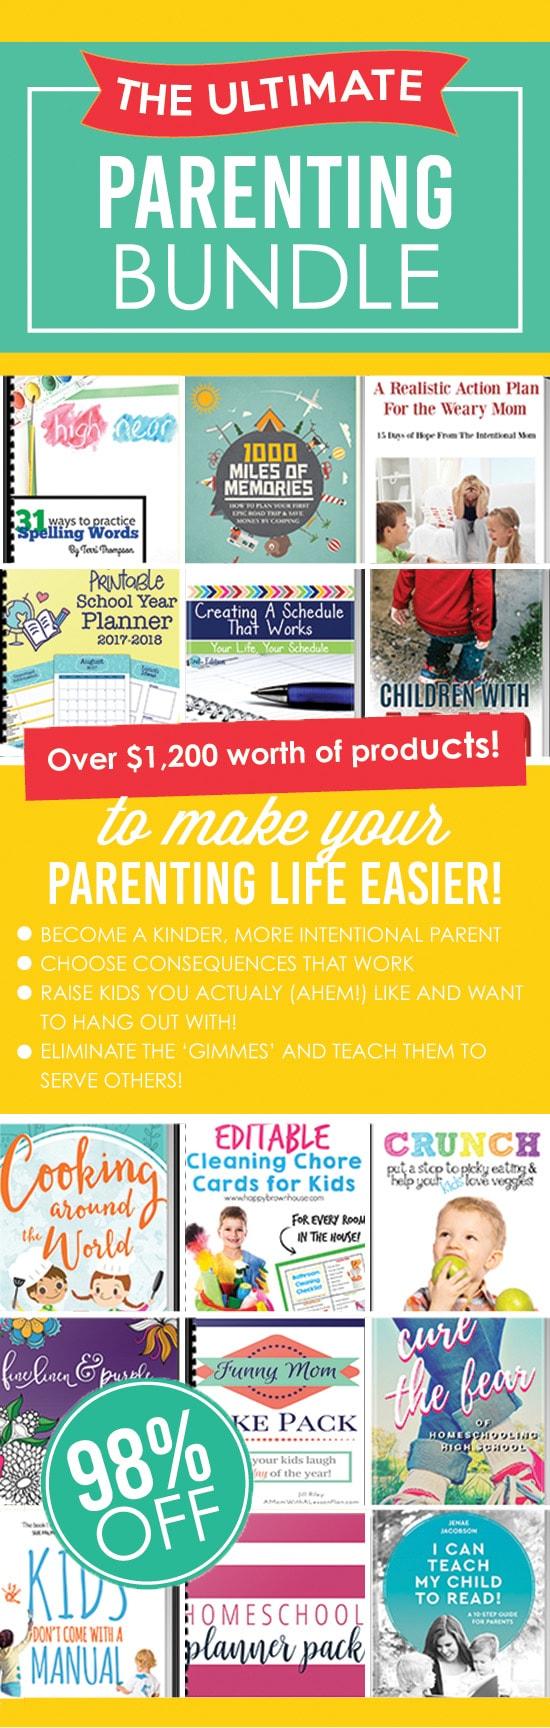 The Ultimate Parenting Super Bundle